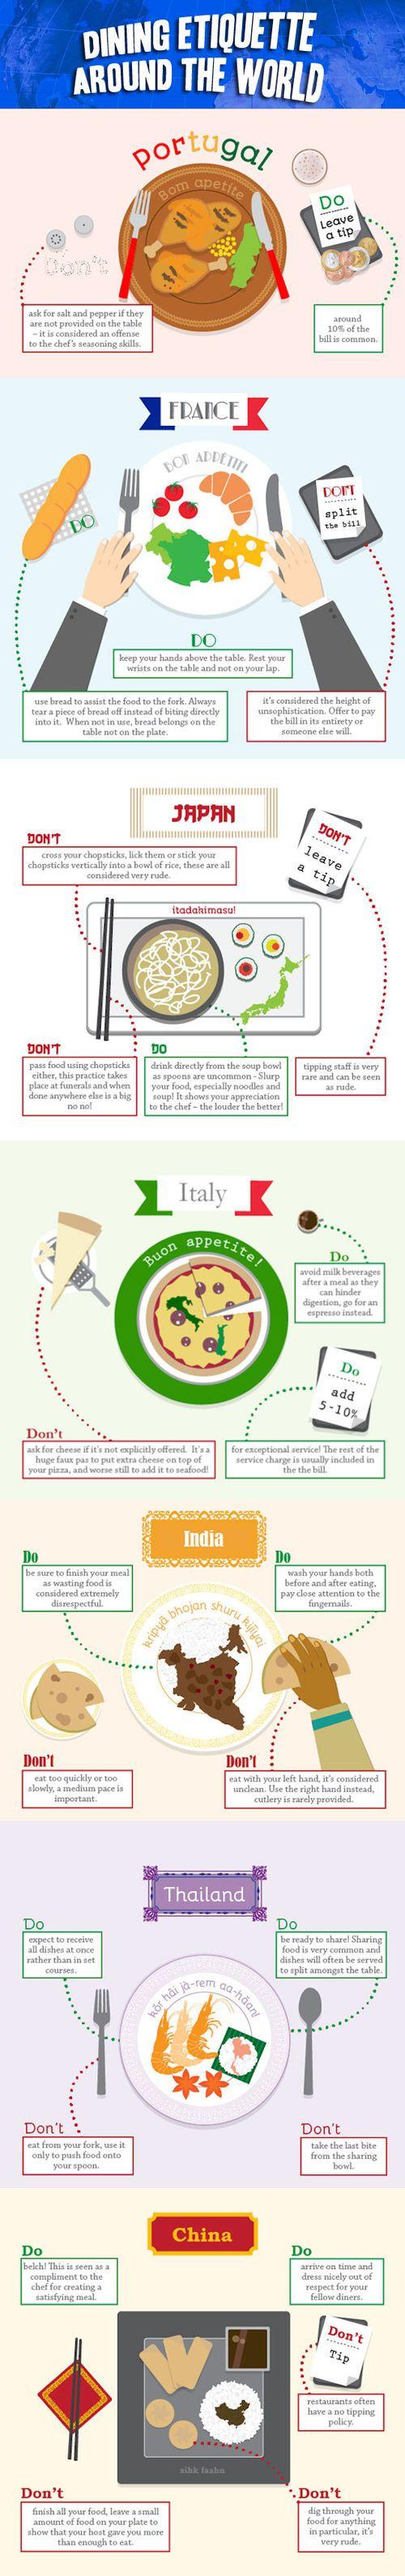 Global dining etiquette